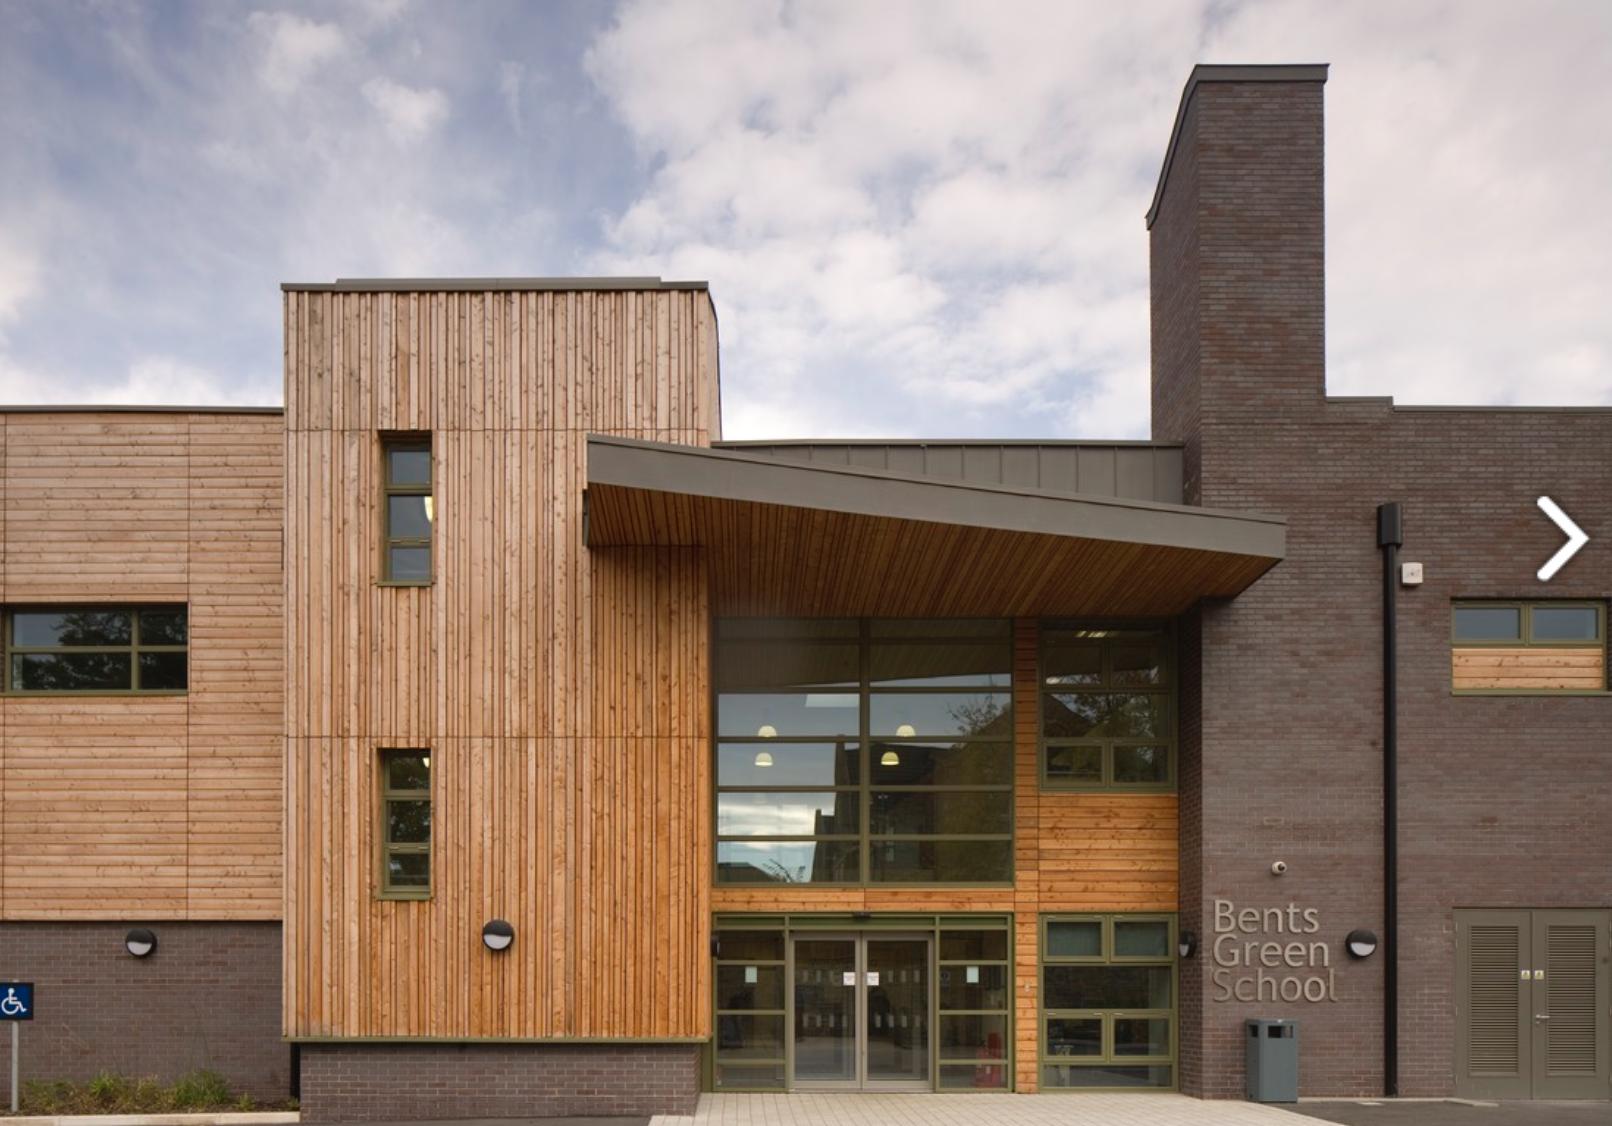 Bents Green School Sheffield